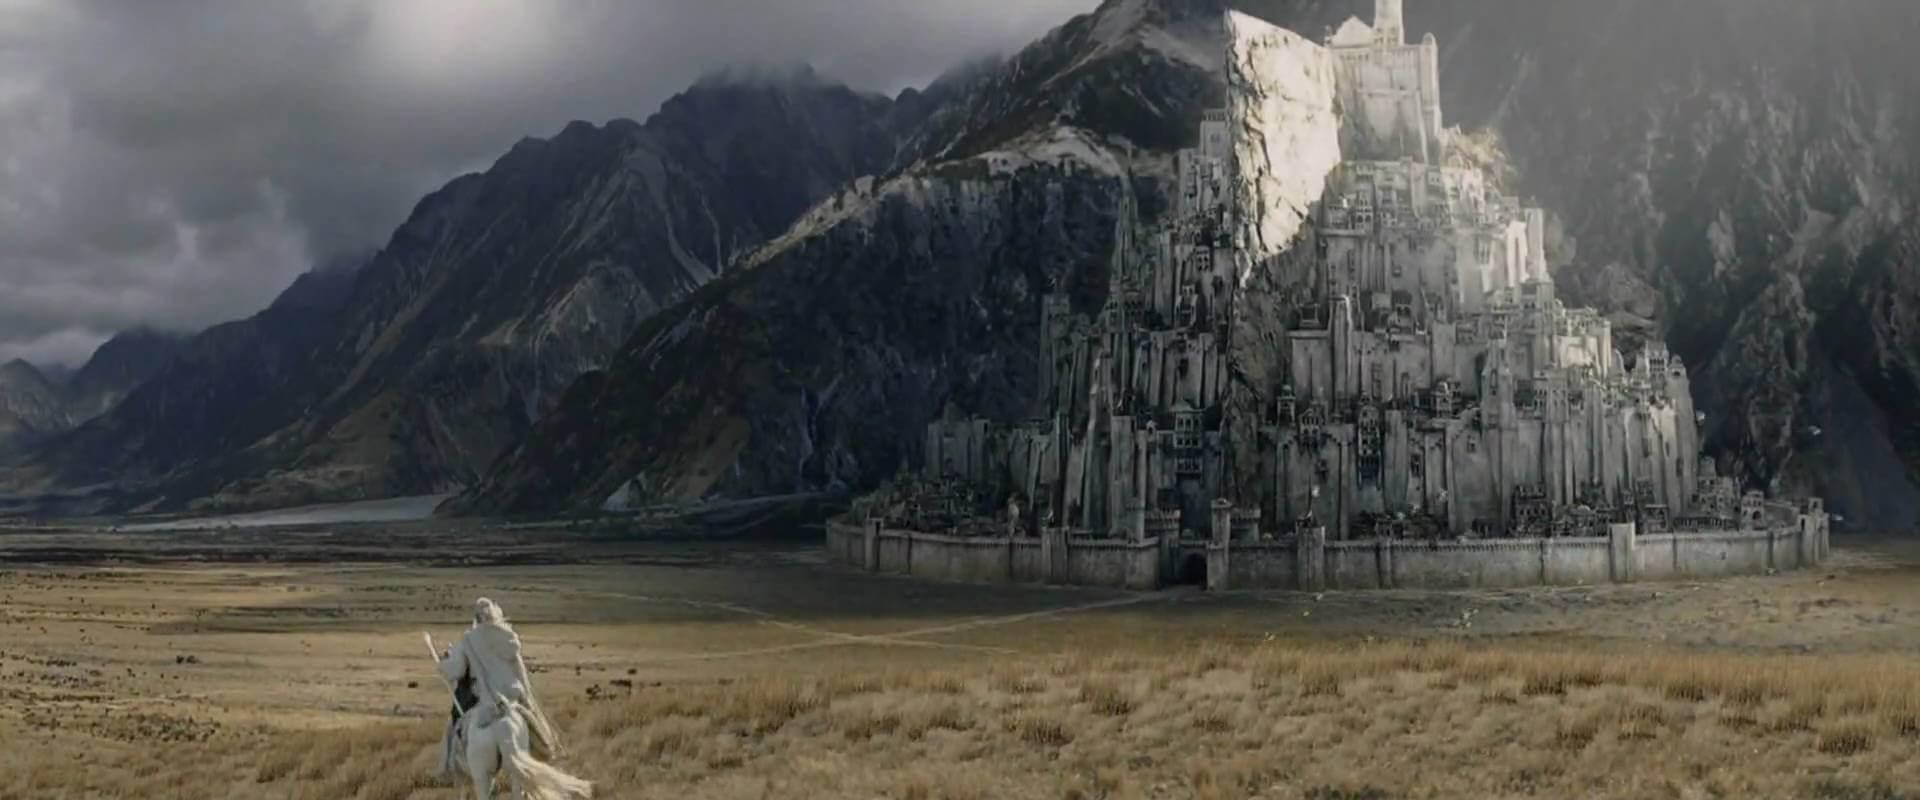 https://medias.spotern.com/content/2019/05/ROTK-Minas-Tirith-Lord-of-the-rings-LOTR-Retour-du-Roi-03.jpg